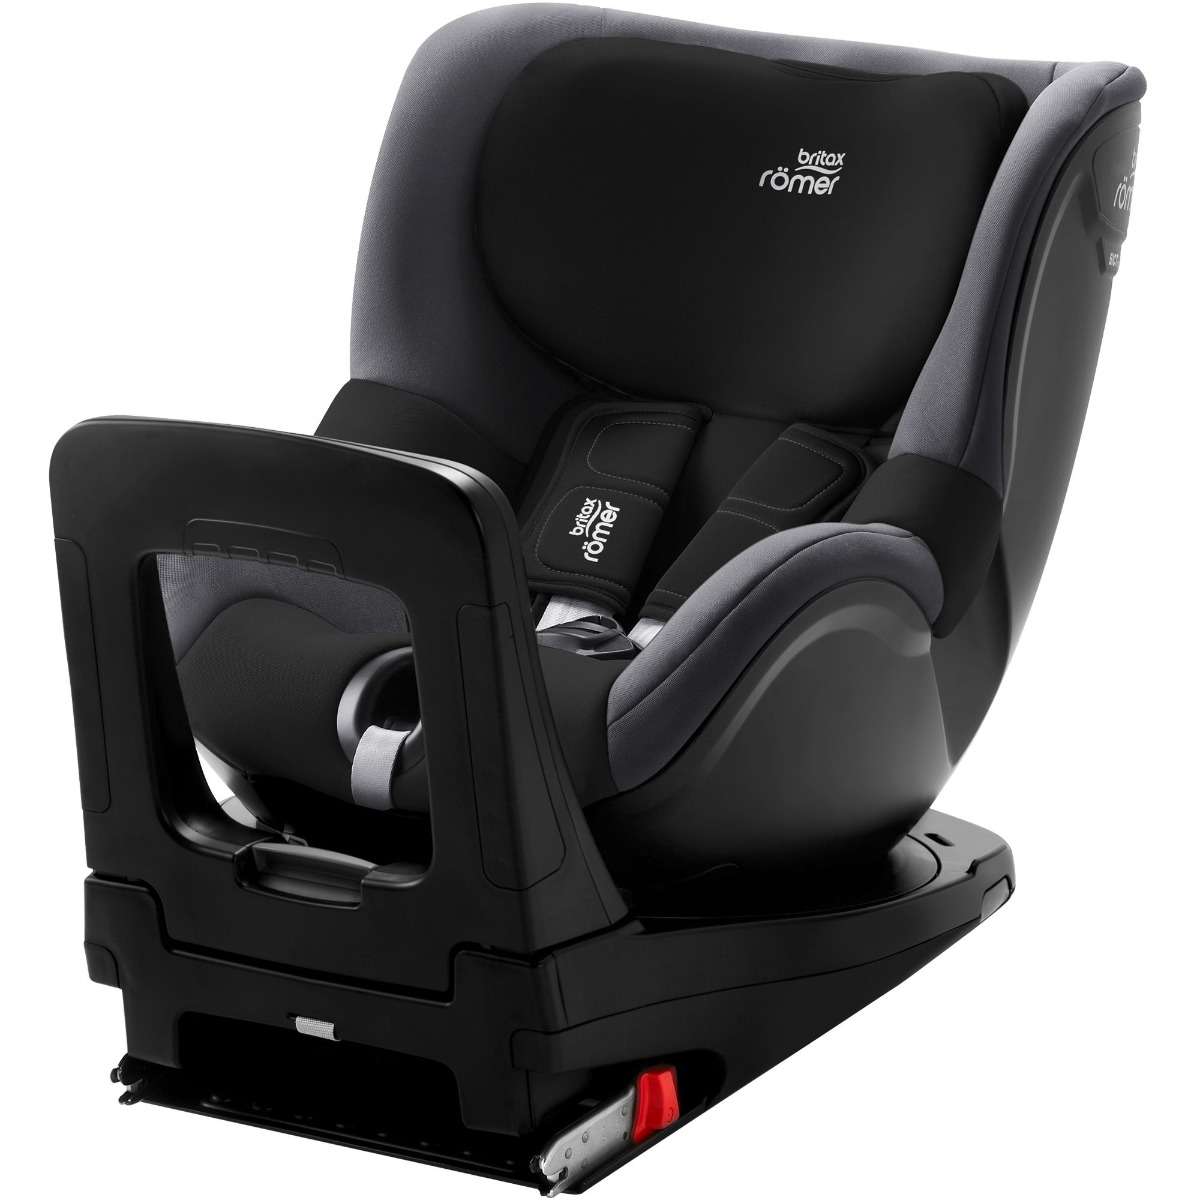 Scaun Auto Cu Isofix Britax Romer Dualfix M I-size, Rotativ, 61-105 Cm, Black Ash